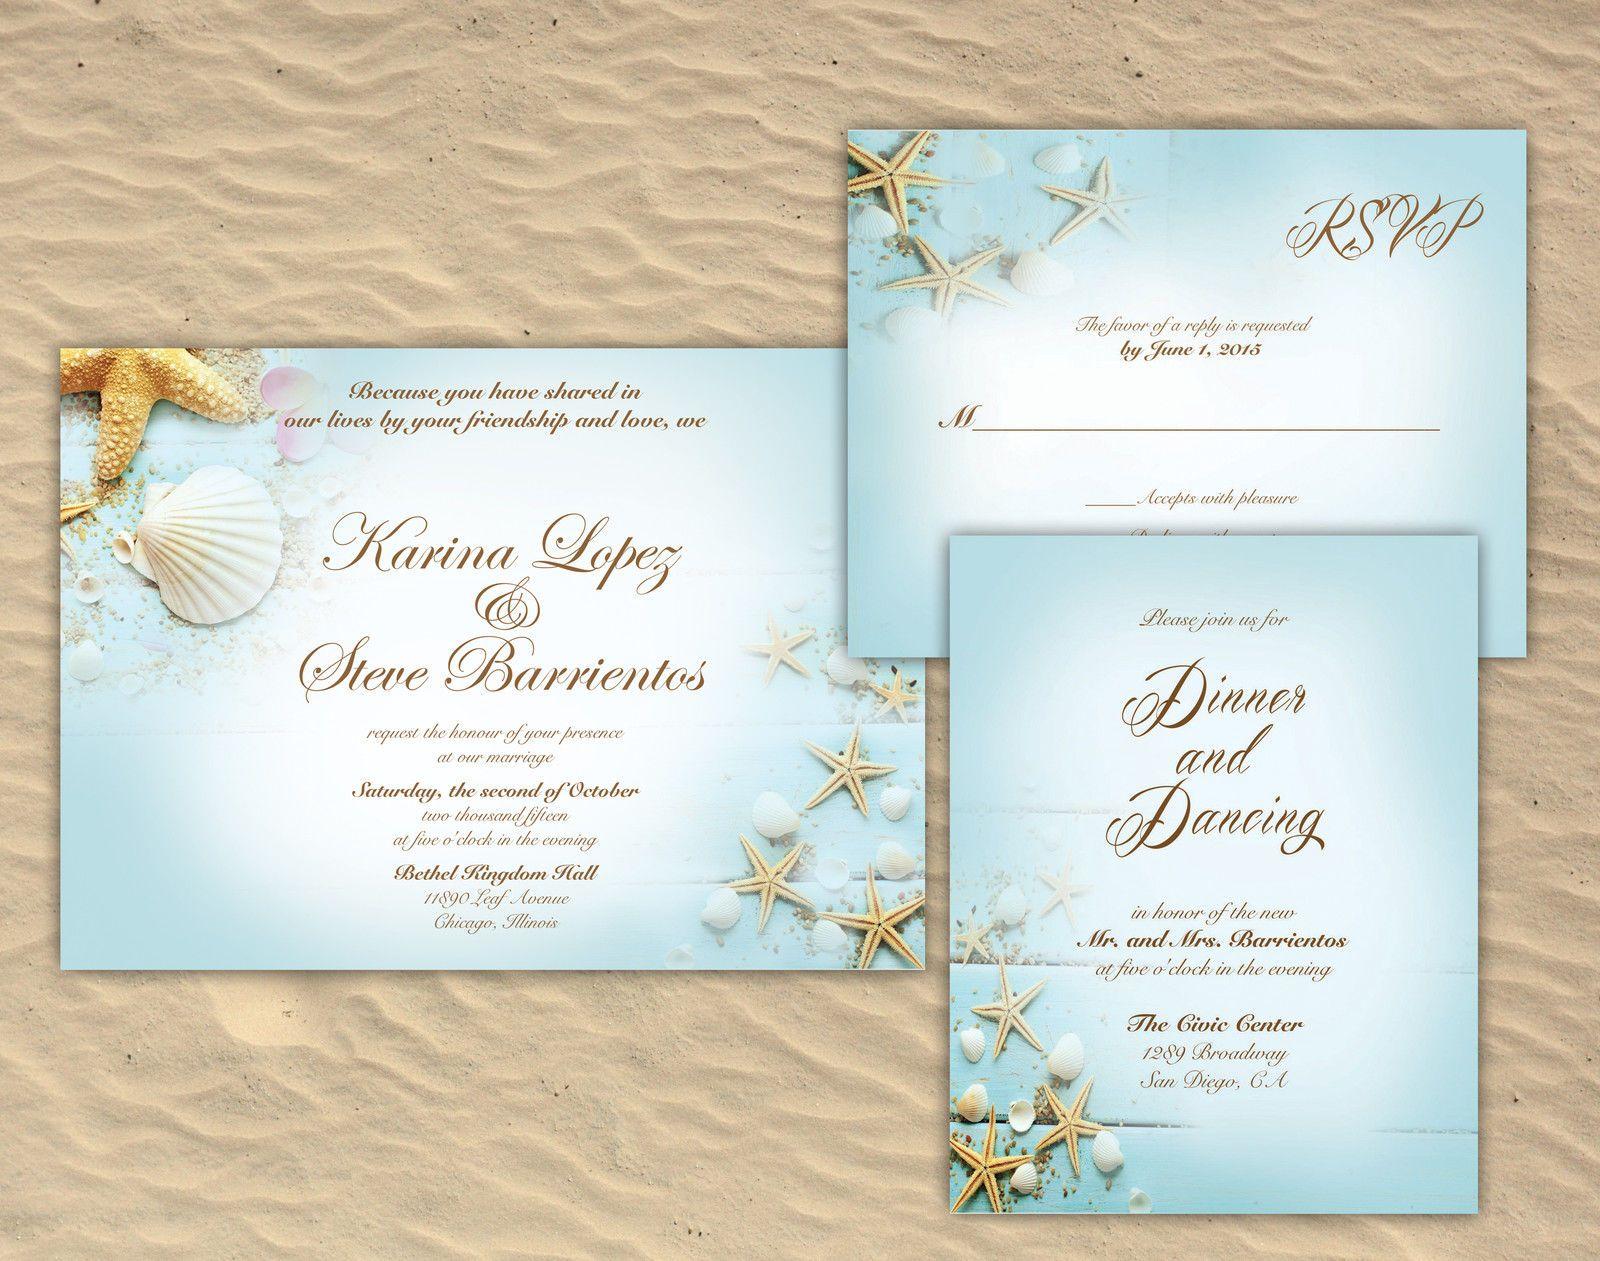 100 Personalized Custom Beach Starfish Ocean Sea Wedding Invitations Set  Summer | eBay (With images) | Wedding invitation sets, Wedding invitations,  Sea wedding